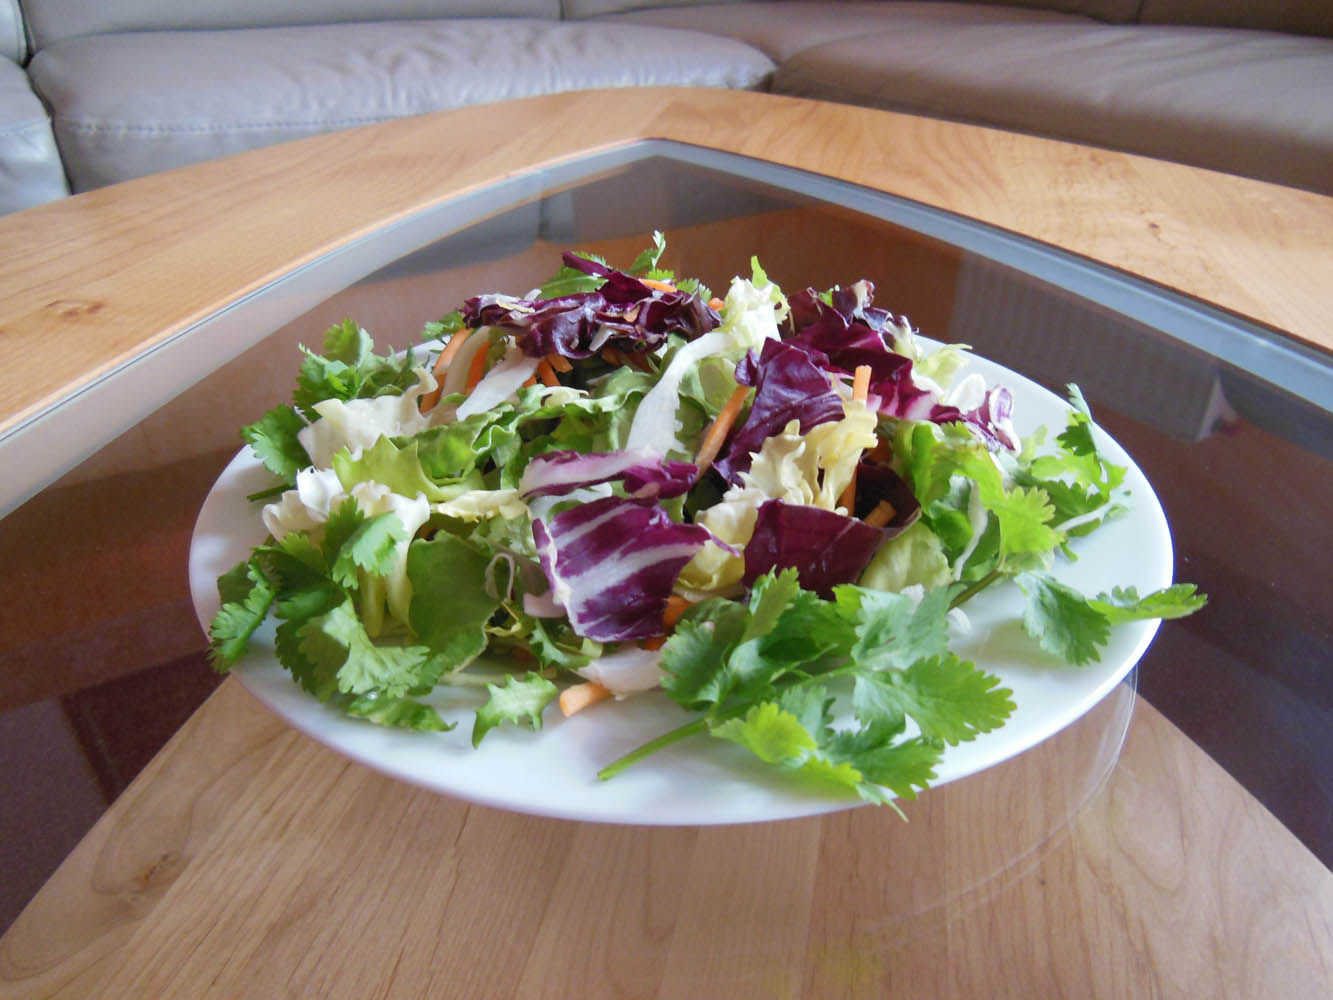 Catering / Partyservice Menü Fürth mit grünem Salat